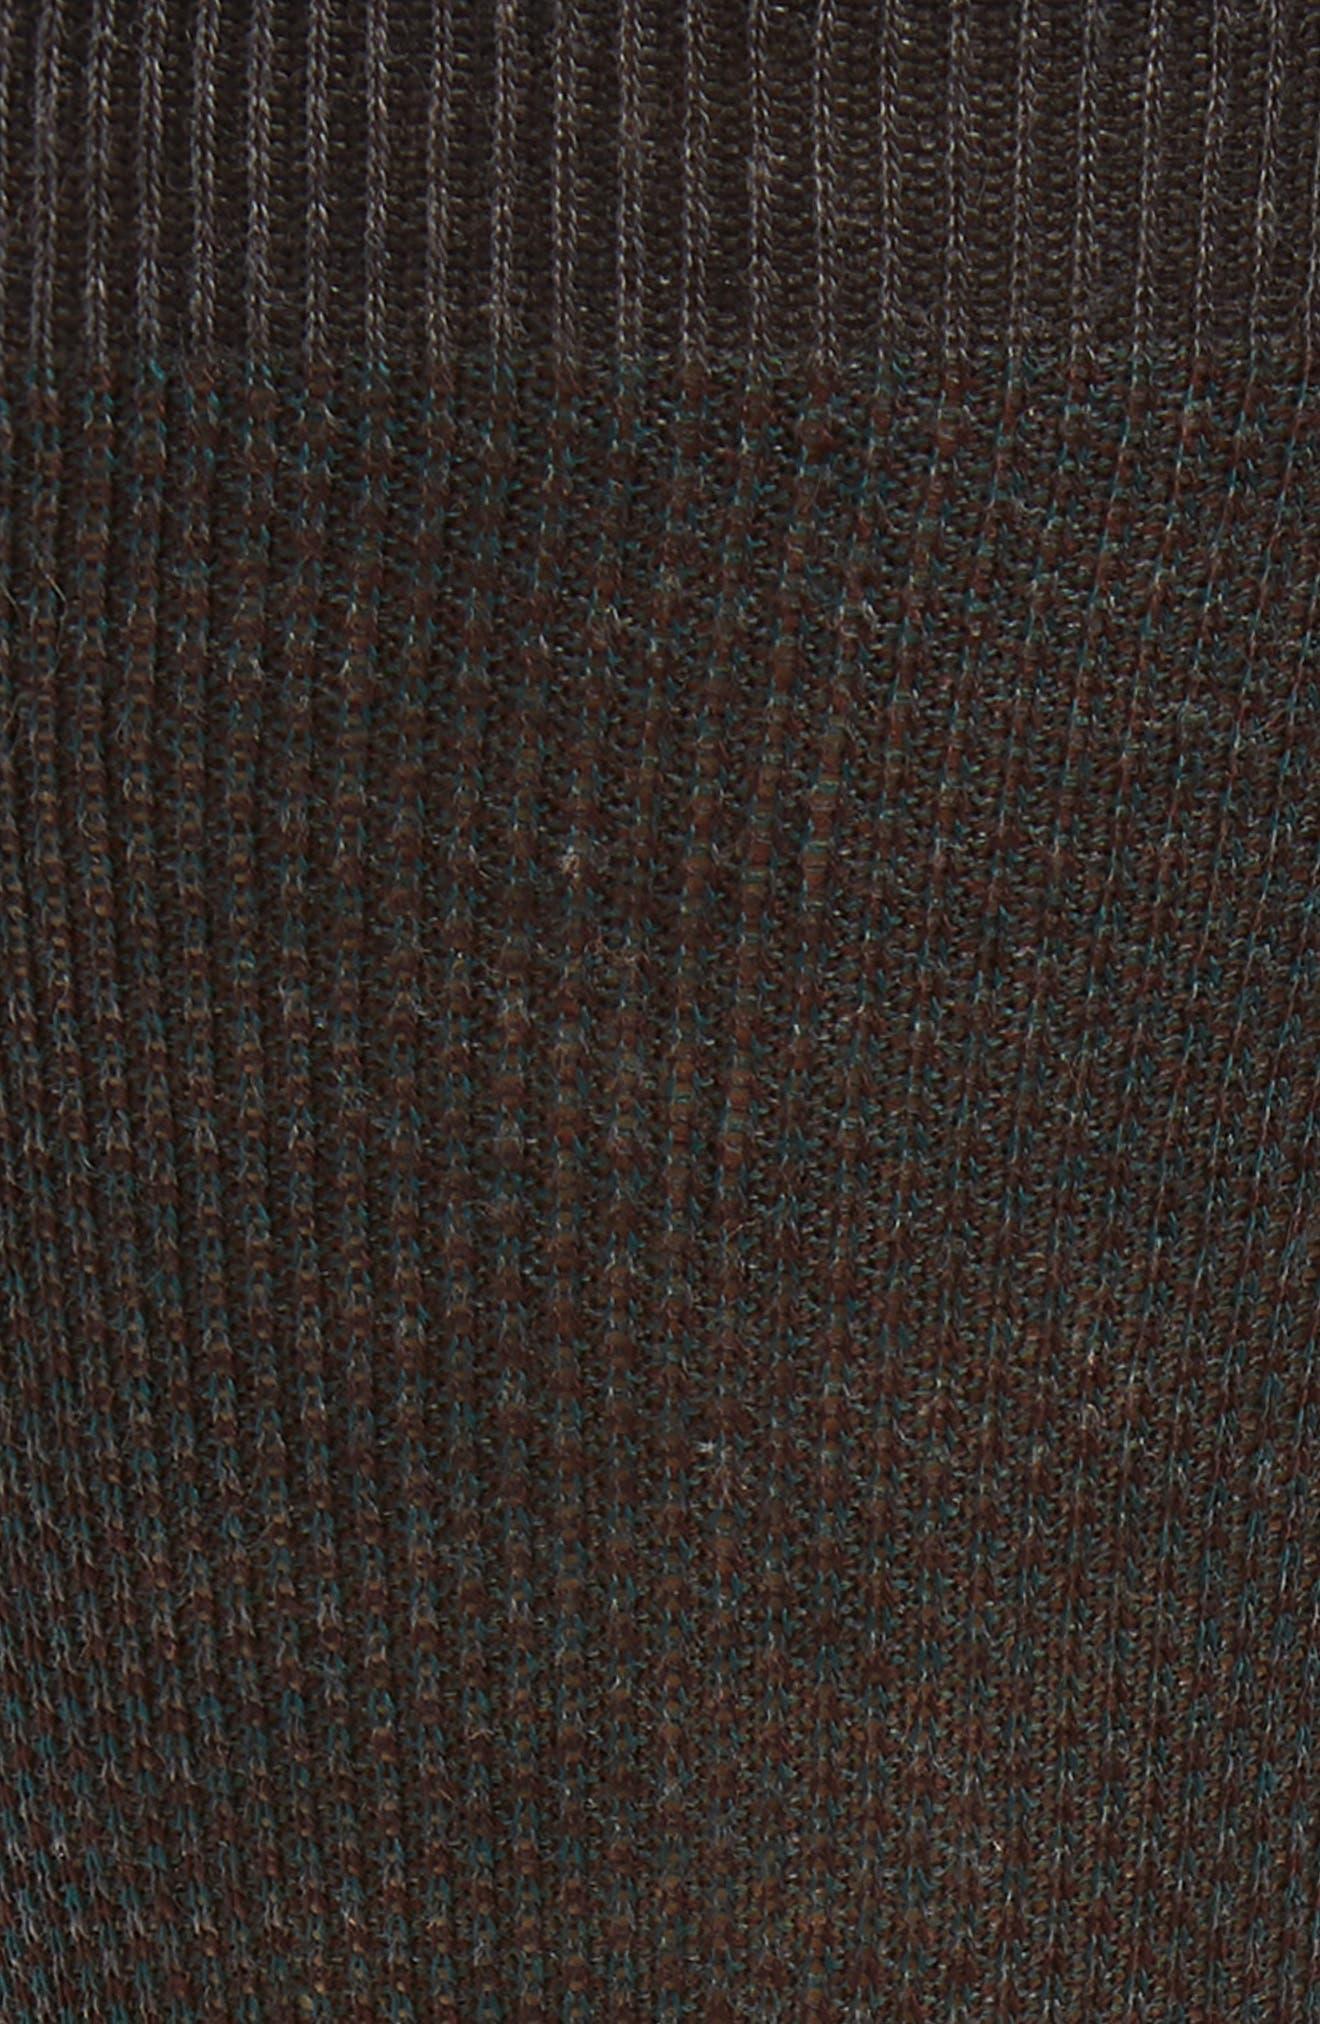 'Vintage Collection - Blenheim' Merino Wool Blend Socks,                             Alternate thumbnail 2, color,                             NEW DARK GREY MIX